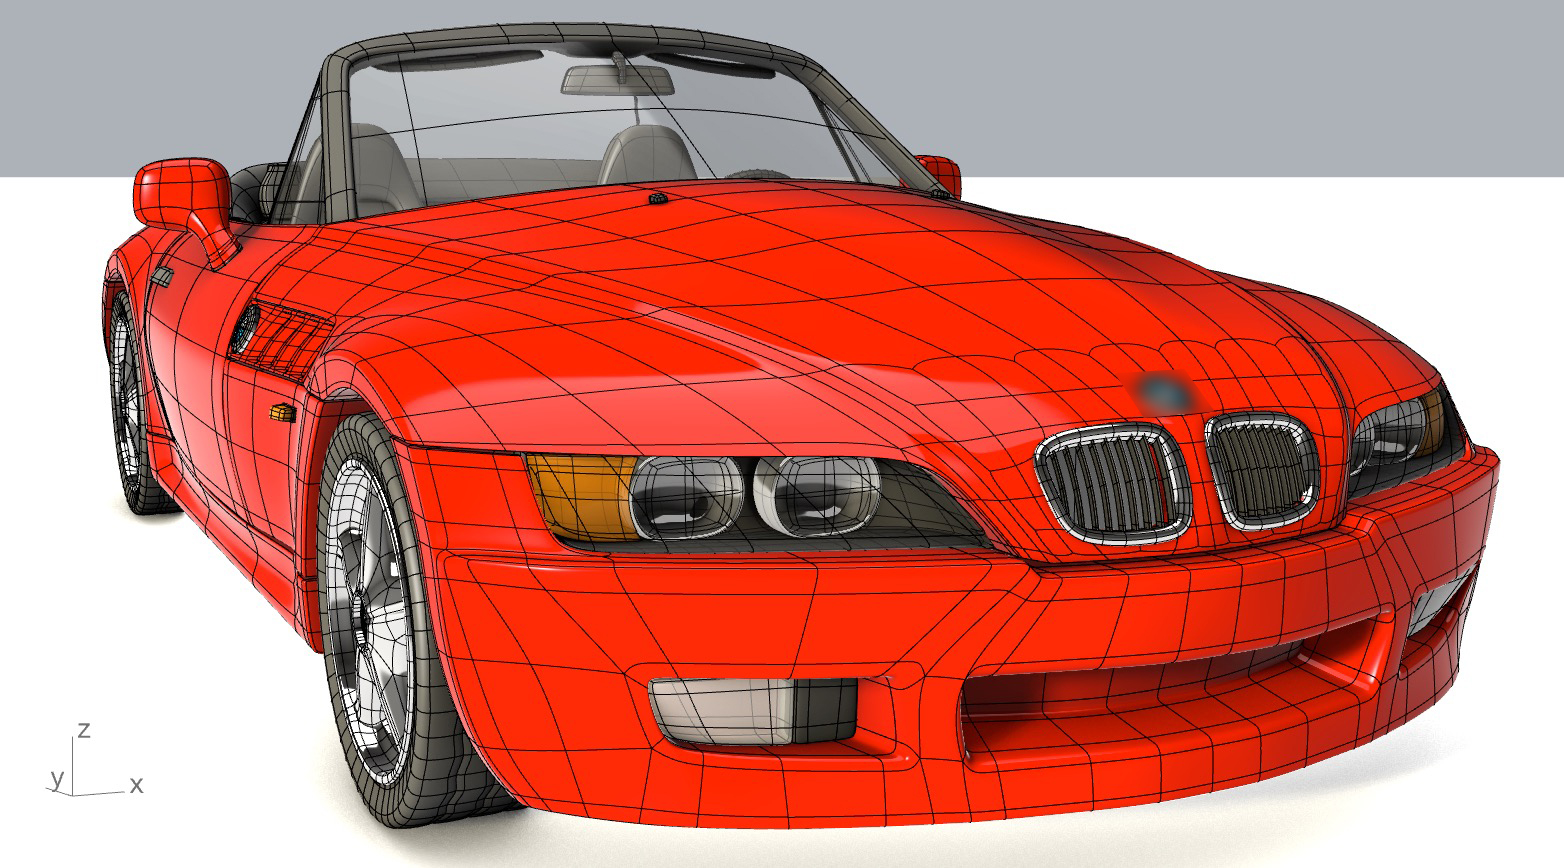 SubD Car by CarterTG